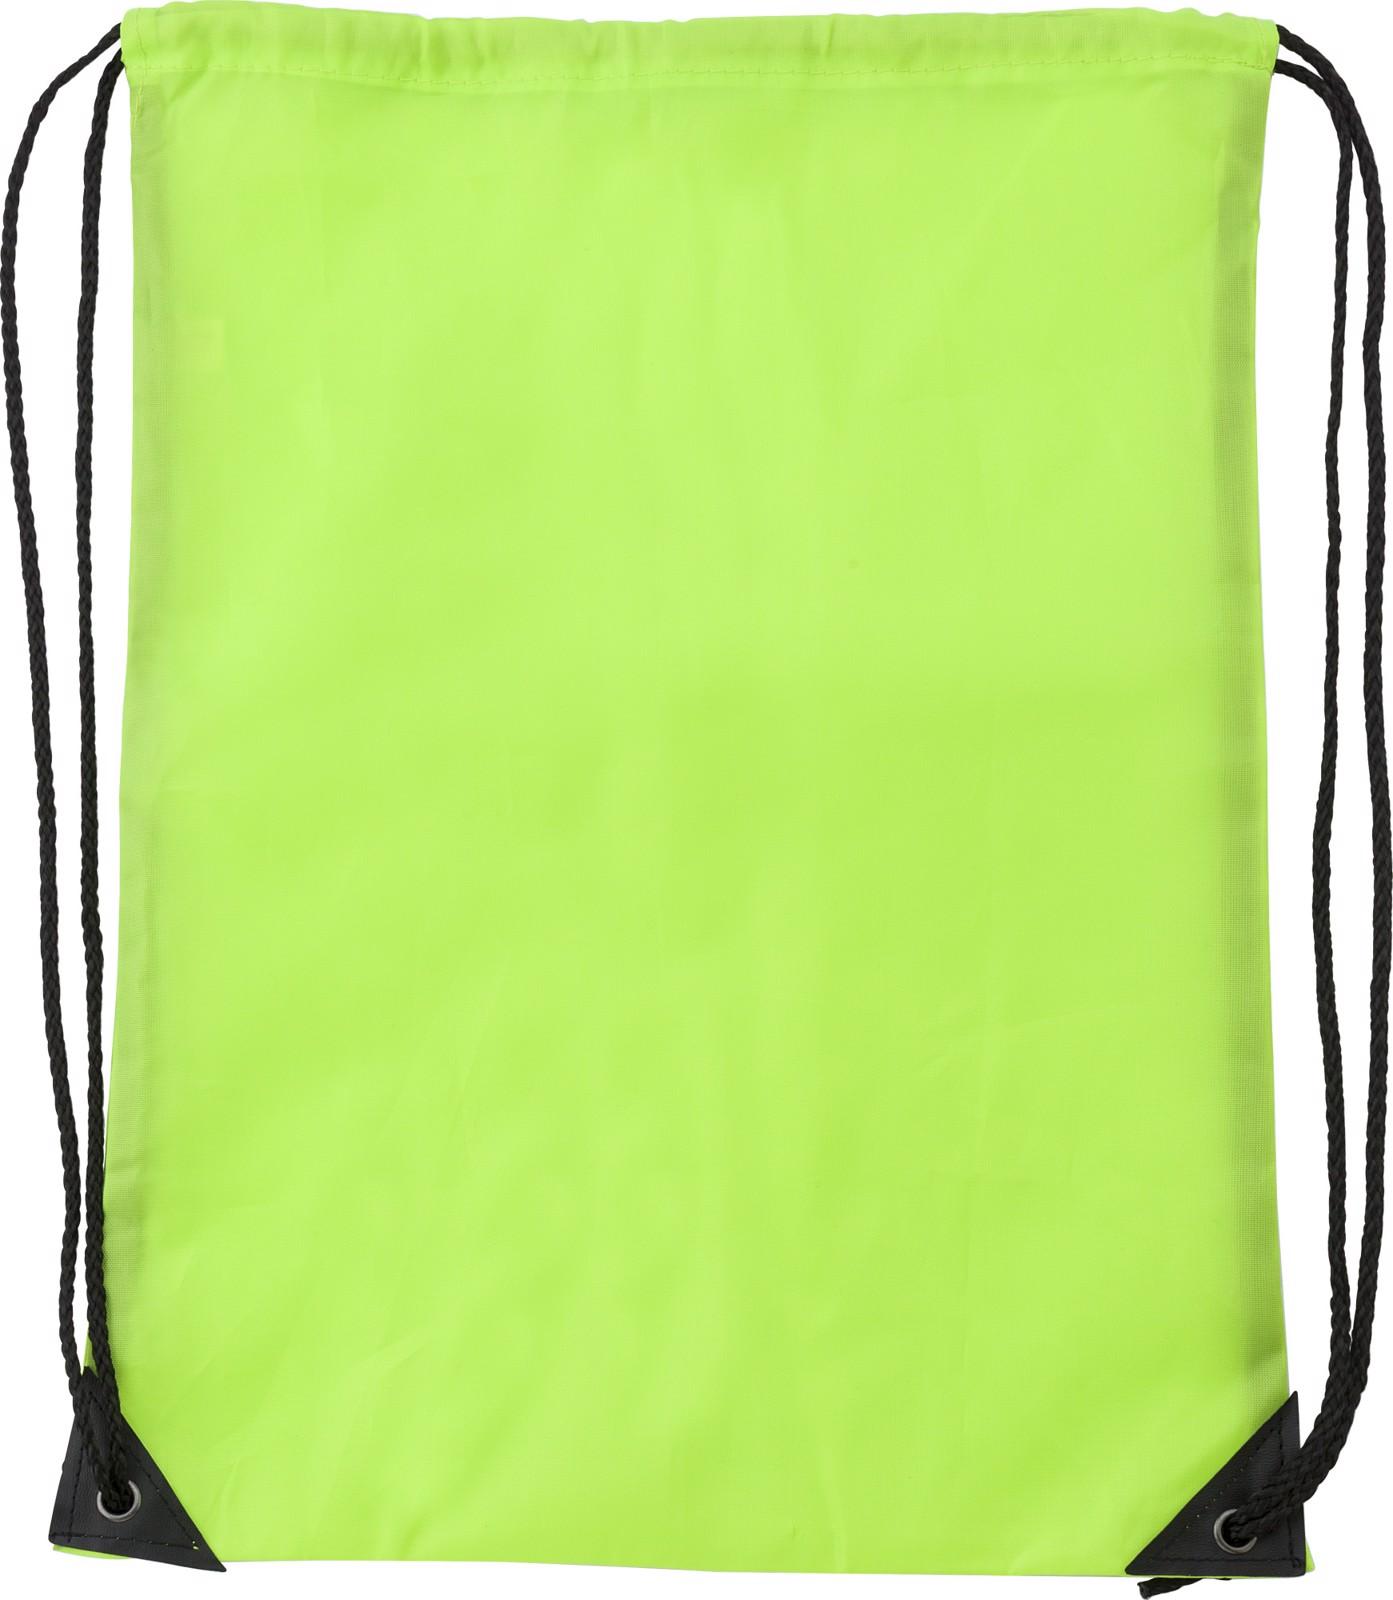 Polyester (210D) drawstring backpack - Lime